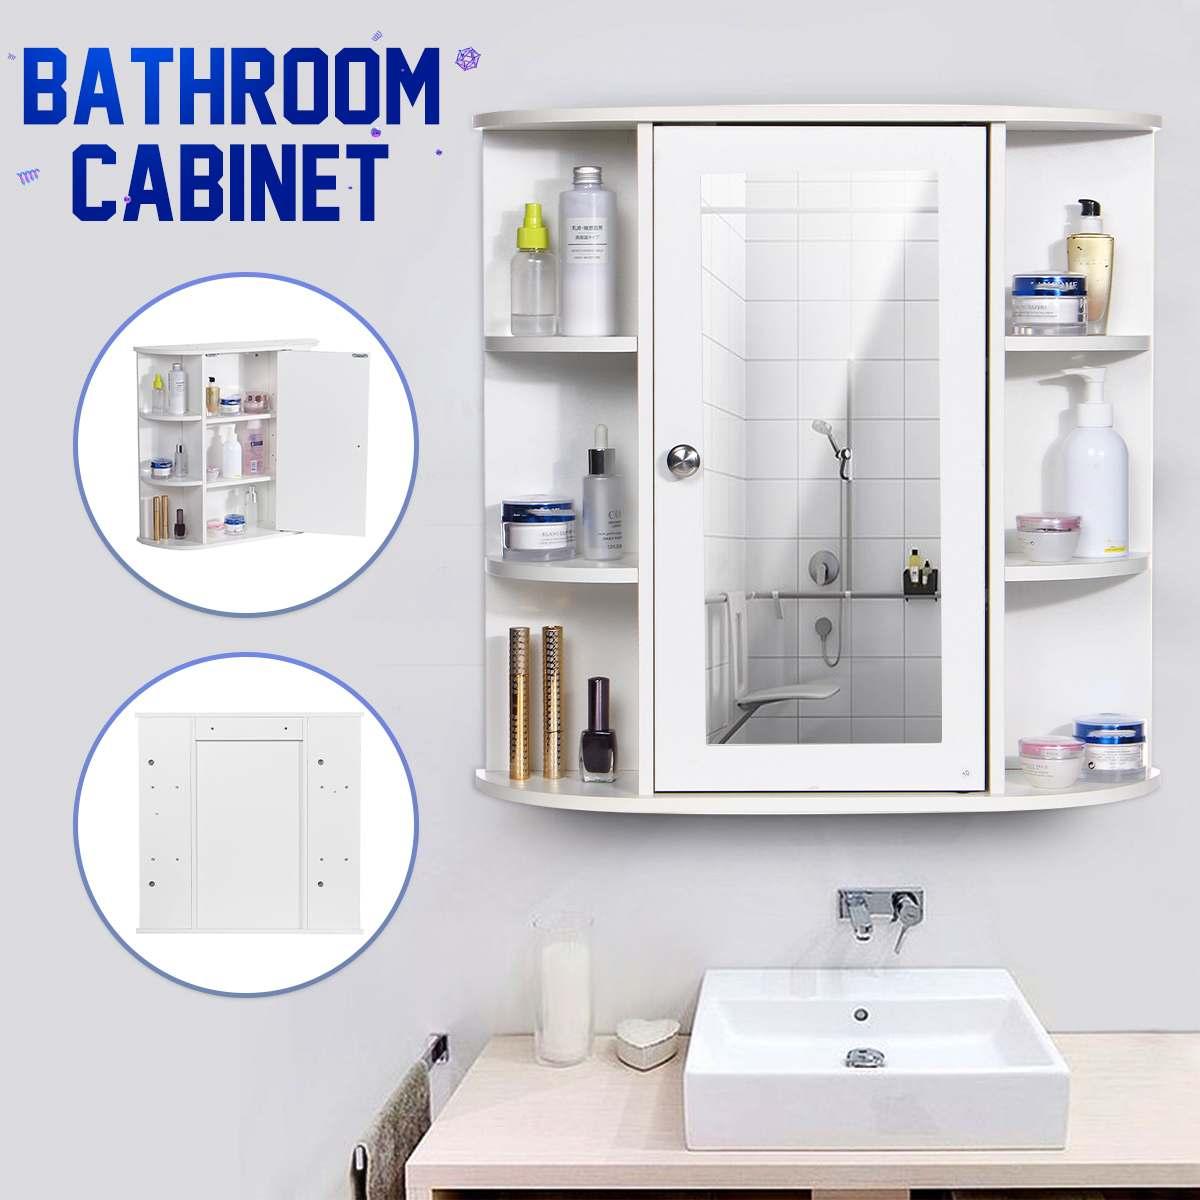 Bathroom Cabinet With Mirror 58 X 60 X 16.5cm Wall Mounted Bathroom Toilet Furniture Cabinet Cupboard Shelf Cosmetic Storager